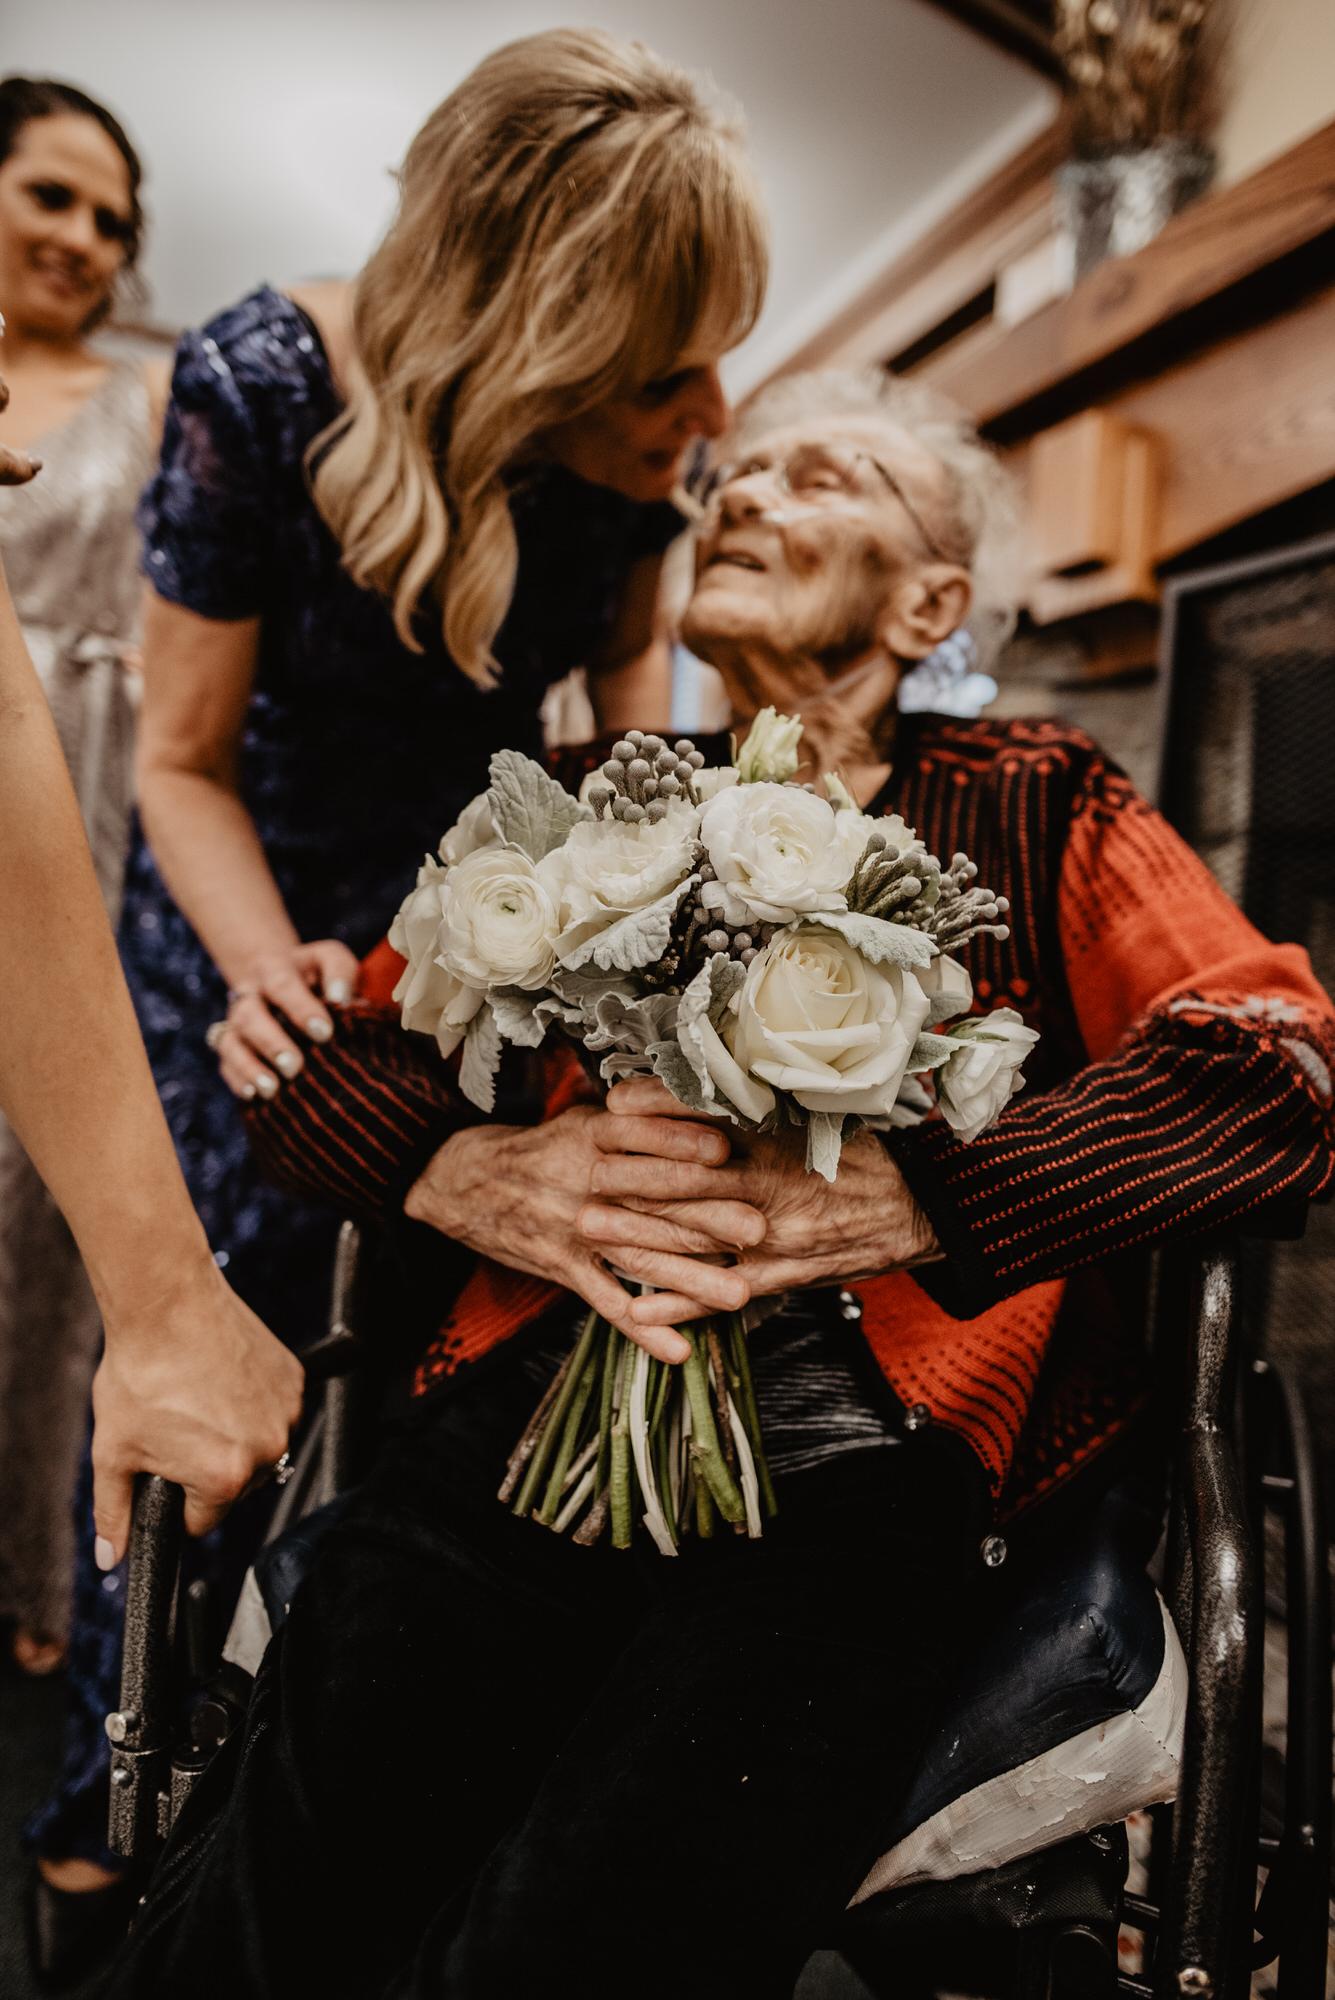 Kaylie_Sirek_Photography_Grand_Island_Kearney_Hastings_Lincoln_Nebraska_Wedding_Engagement_Grandma_Grandparent_Delray_Downtown_DowntownLincoln_LNK_Emotional_Bride_Groom_Photographer_47.jpg